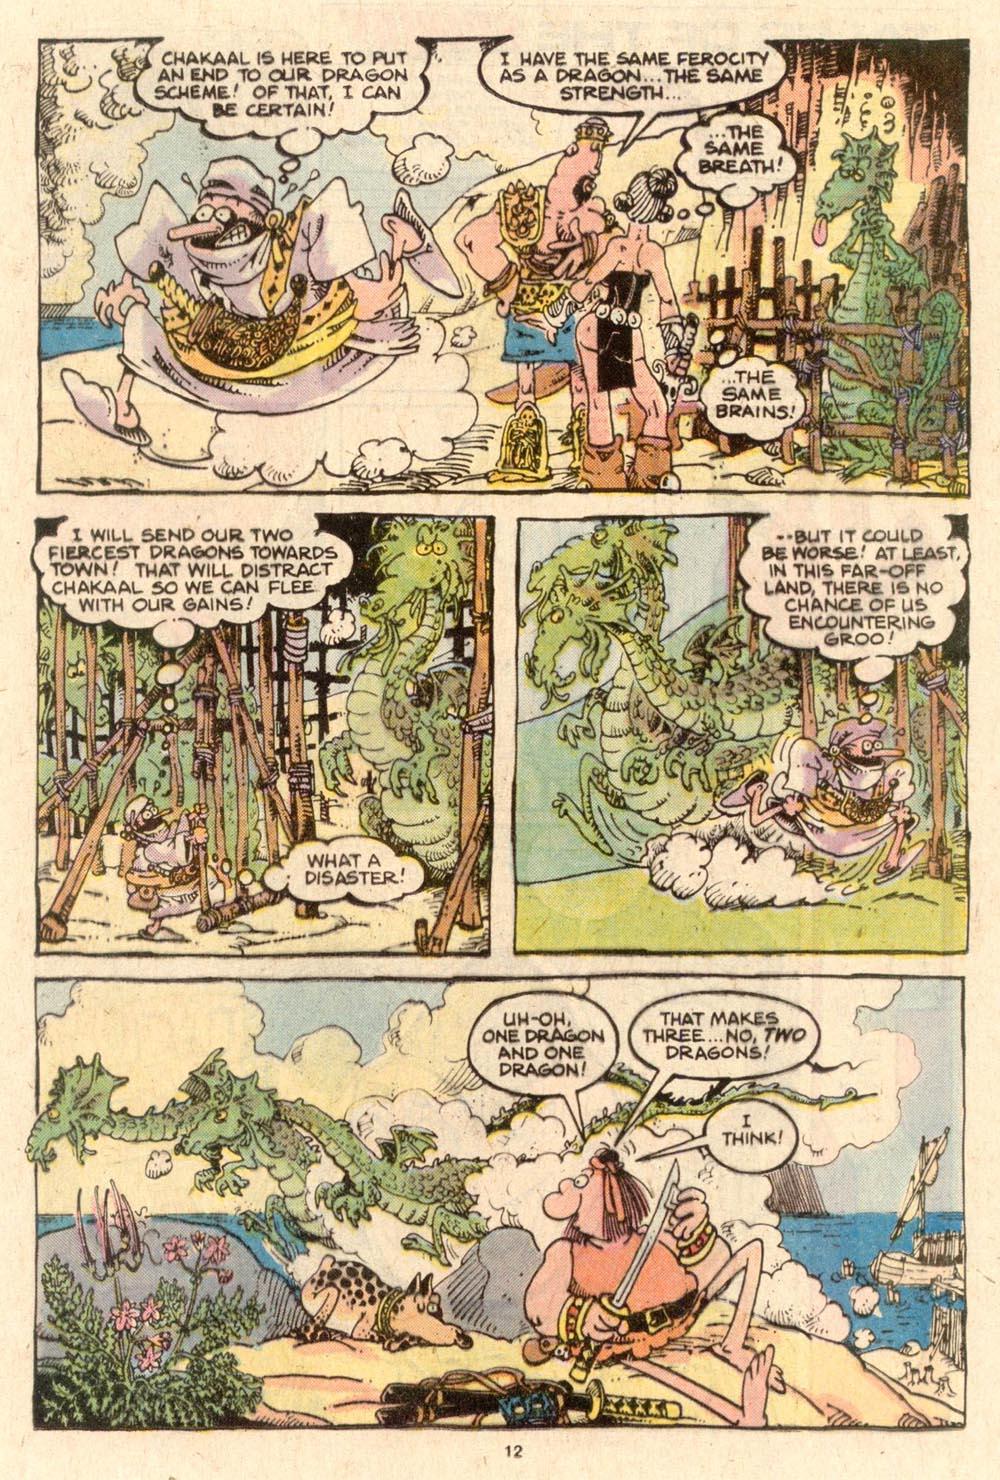 Read online Sergio Aragonés Groo the Wanderer comic -  Issue #53 - 12